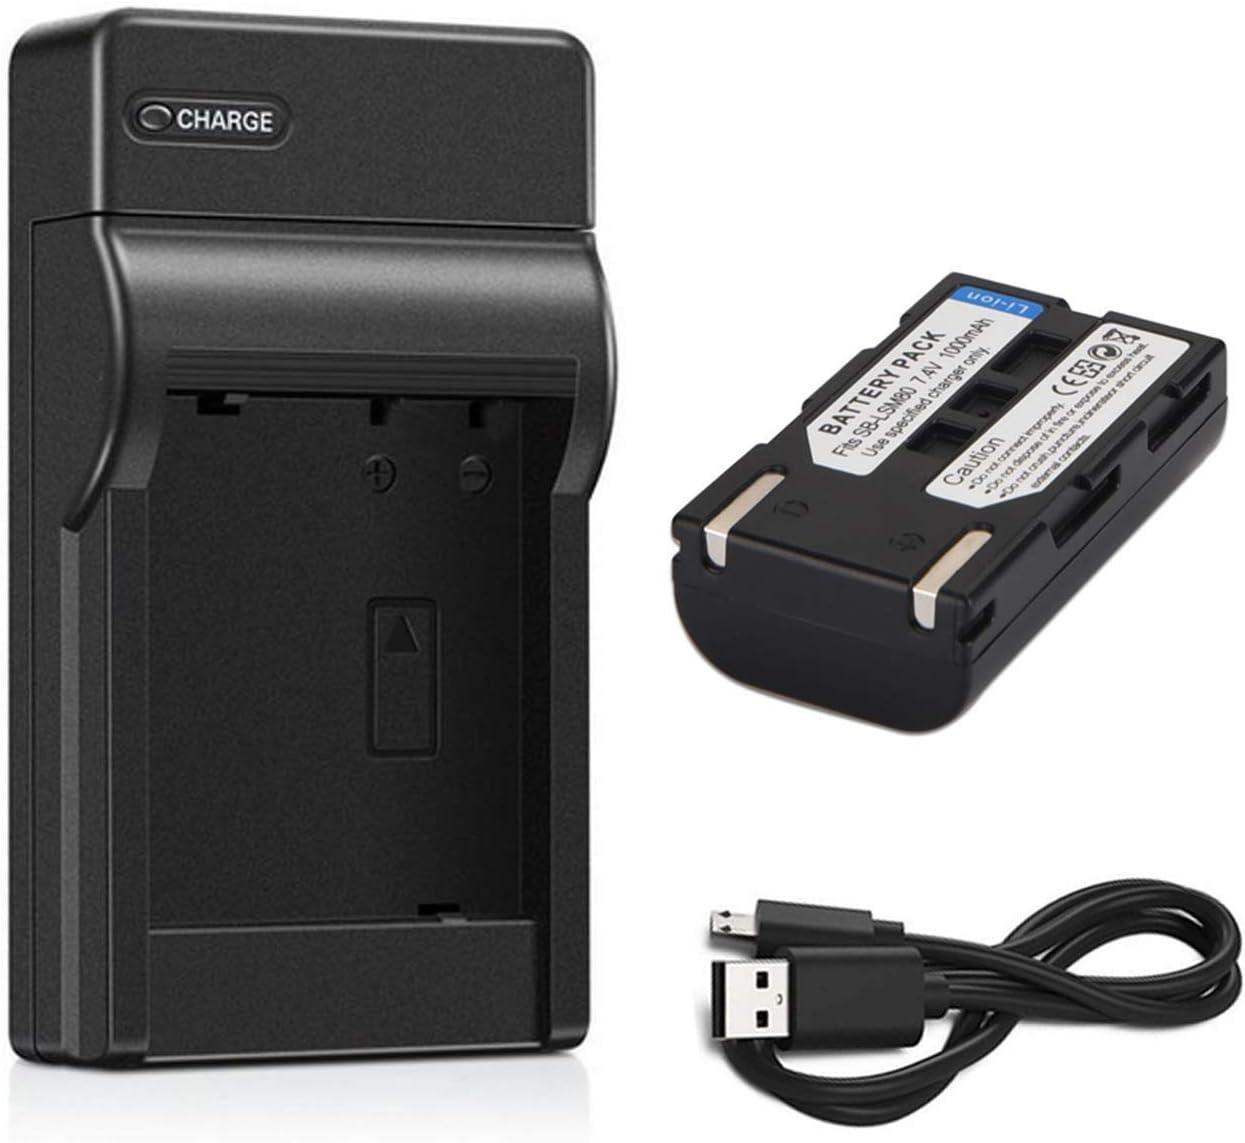 VP-D453i VP-D452Bi Battery VP-D454i VP-D455i Digital Camcorder Charger for Samsung VP-D451i